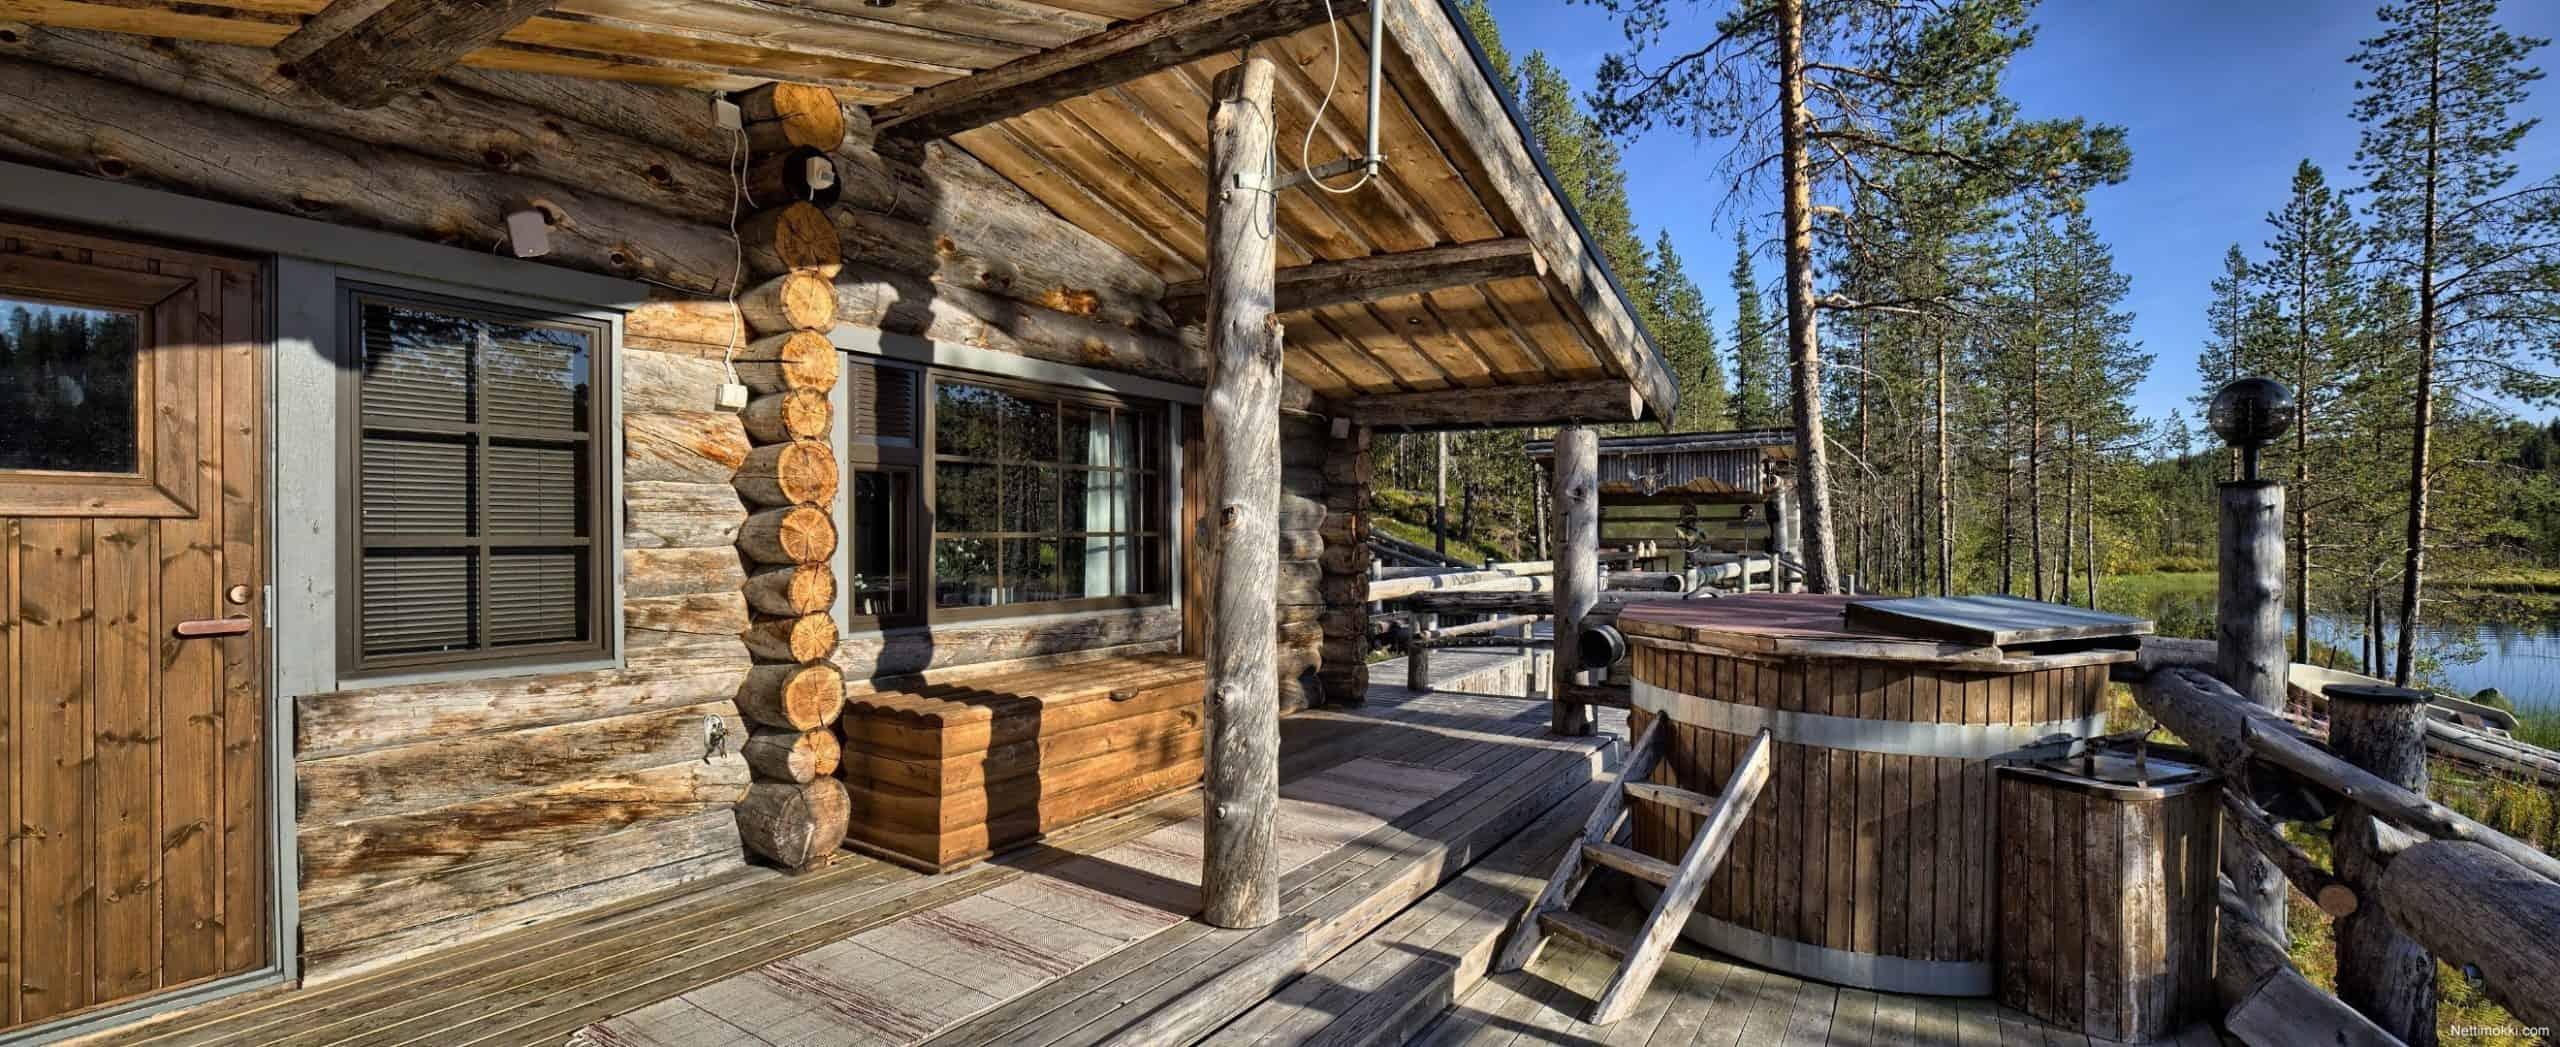 Lappland Snowkite-Camp 29.01.-09.02. 2022 8